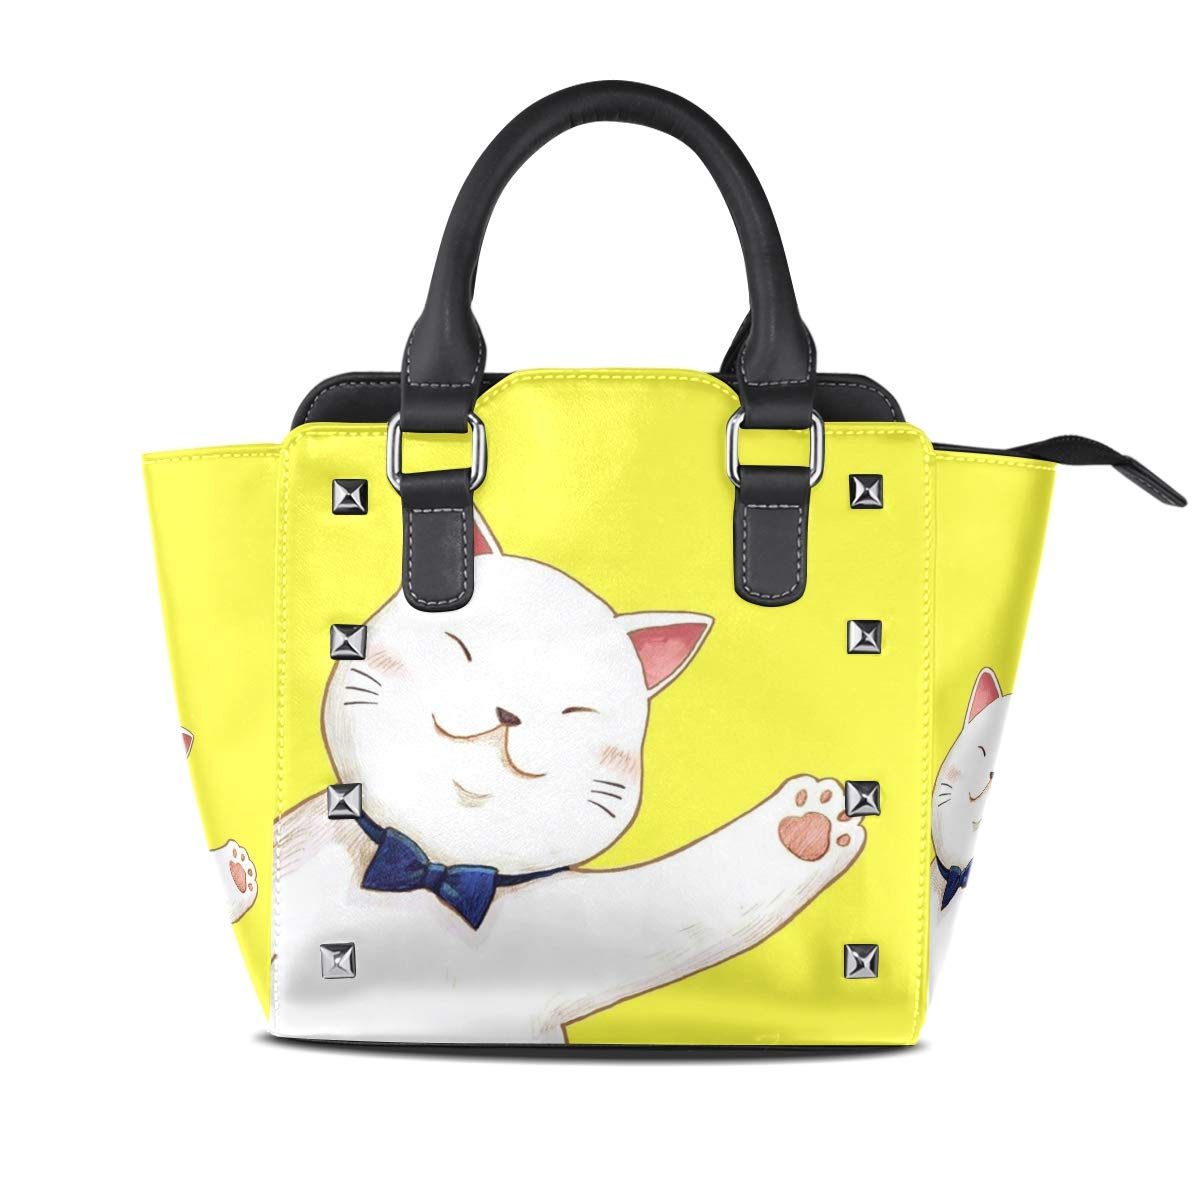 Design1 Cat Top Handle Satchel Handbags Leather Tote Adjustable Shoulder Rivet Bag for Women